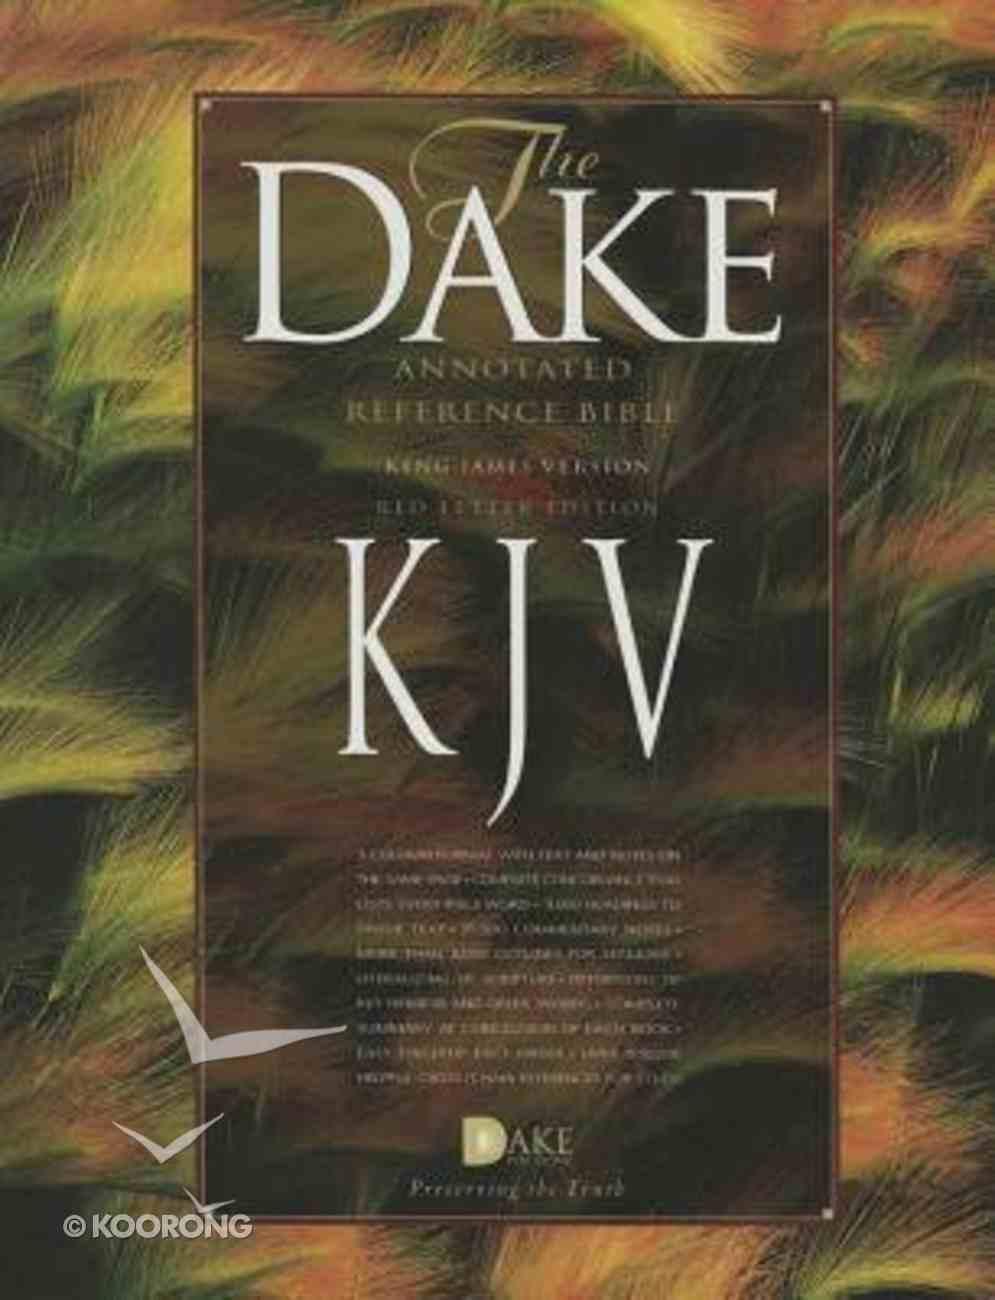 KJV Dake's Annotated Bible Burgundy Bonded Leather